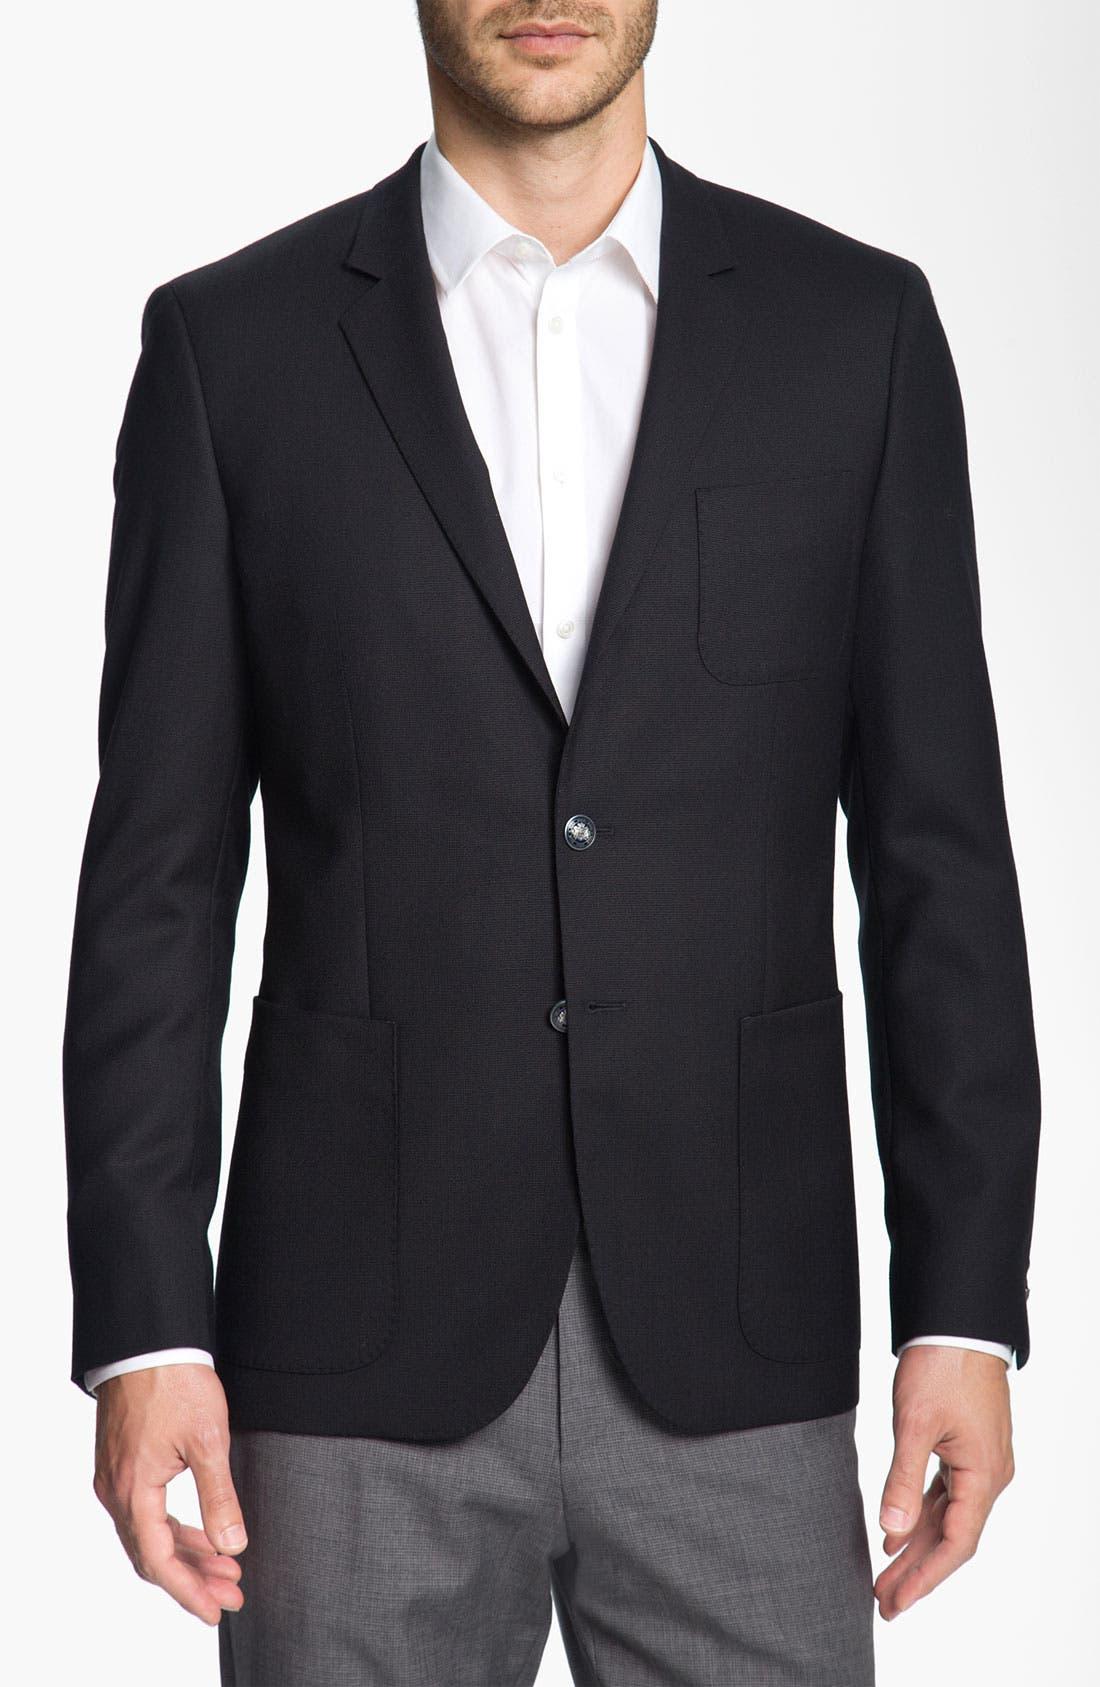 Alternate Image 1 Selected - BOSS Black 'Rover' Extra Trim Fit Blazer